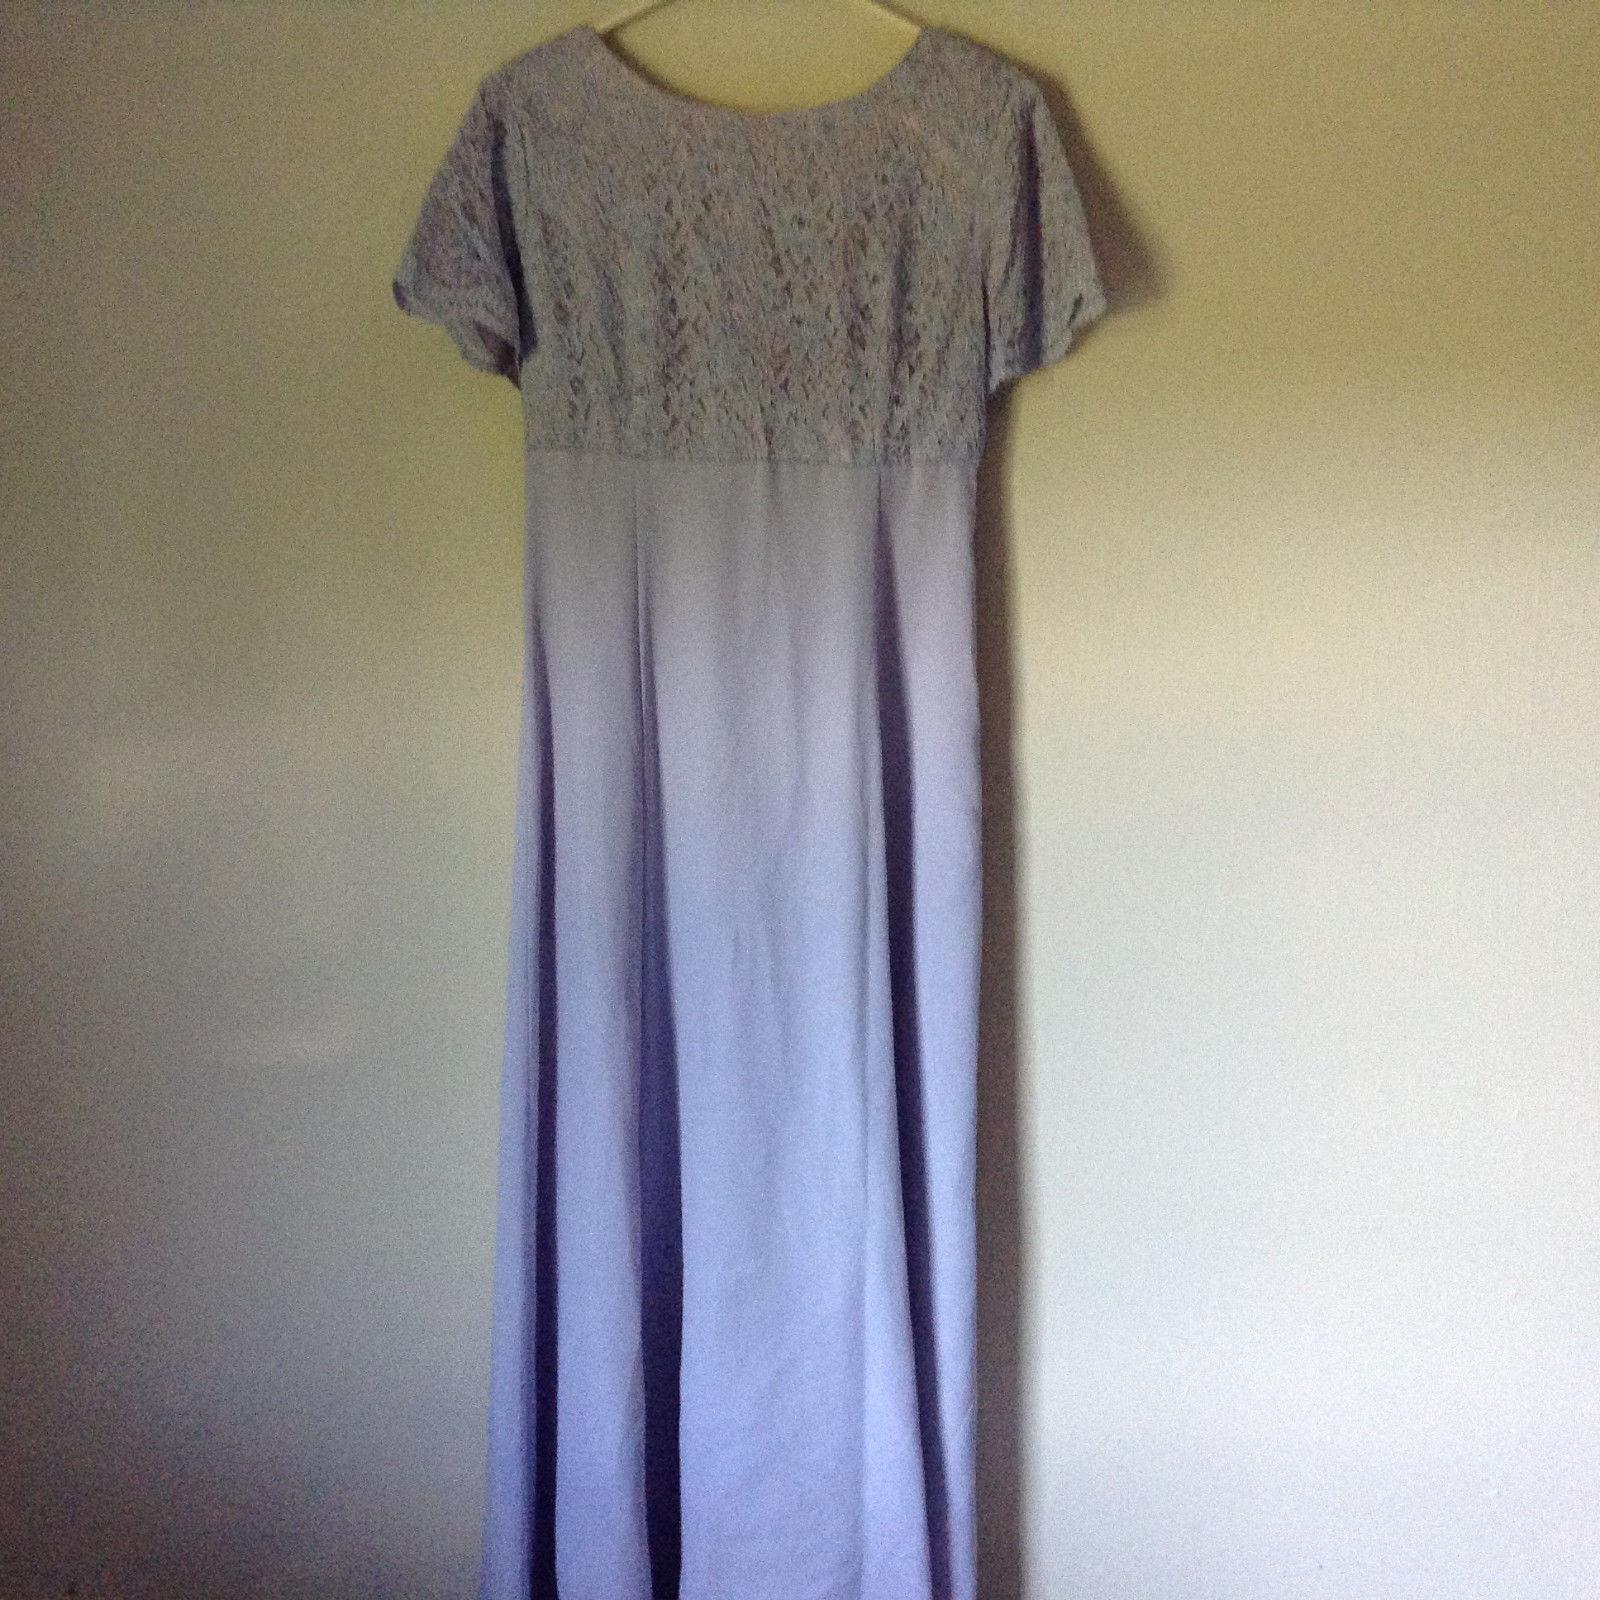 Light Purple Lavender Gown Dress Flowers on Back Light Shoulder Pads No Tag